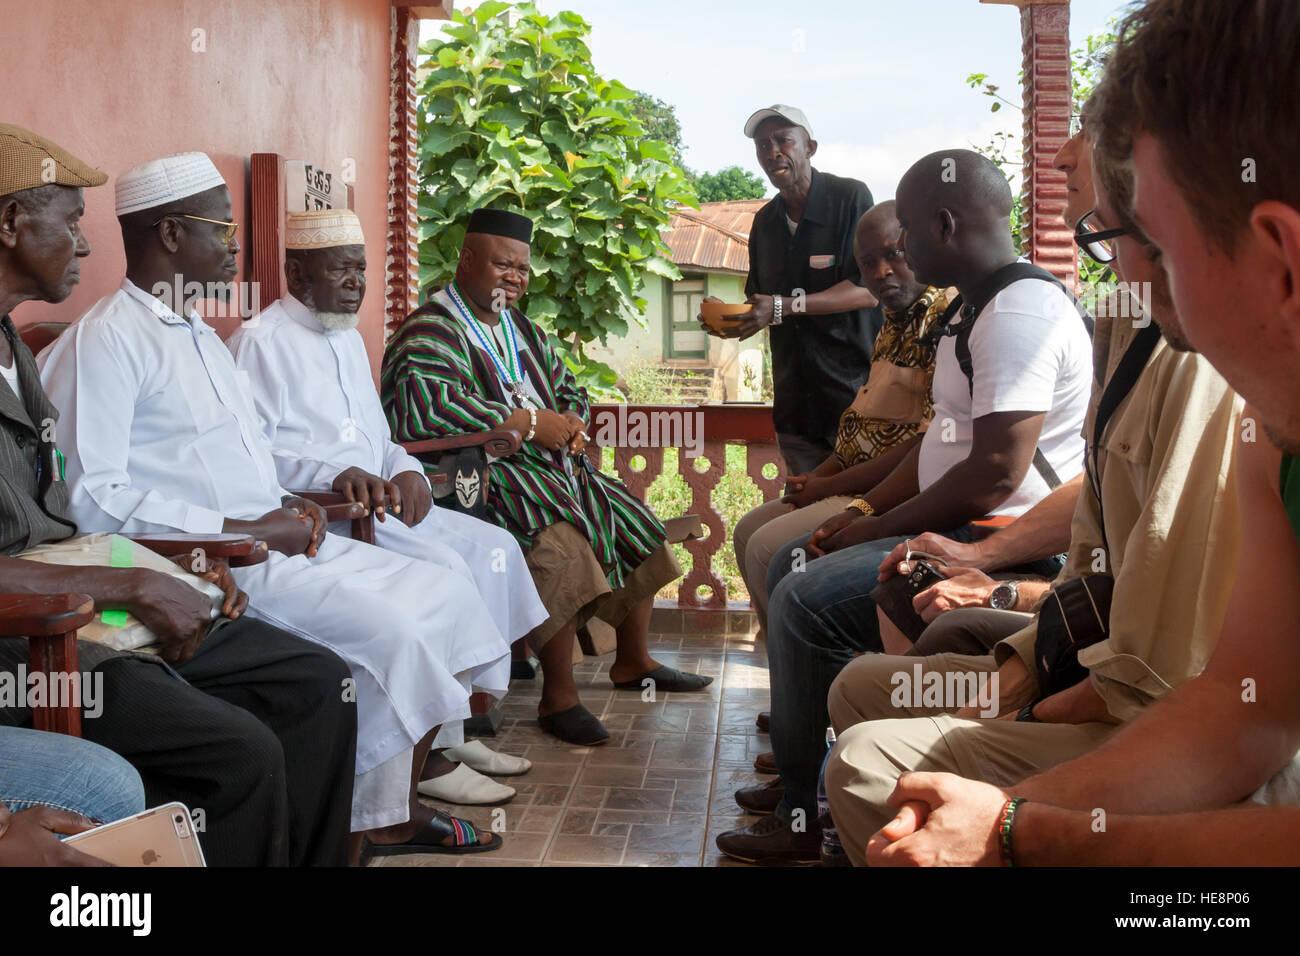 Paramount chief P.C. Grawuru III. and his team is welcoming guests to the Wara Wara Yagala chiefdom - Stock Image